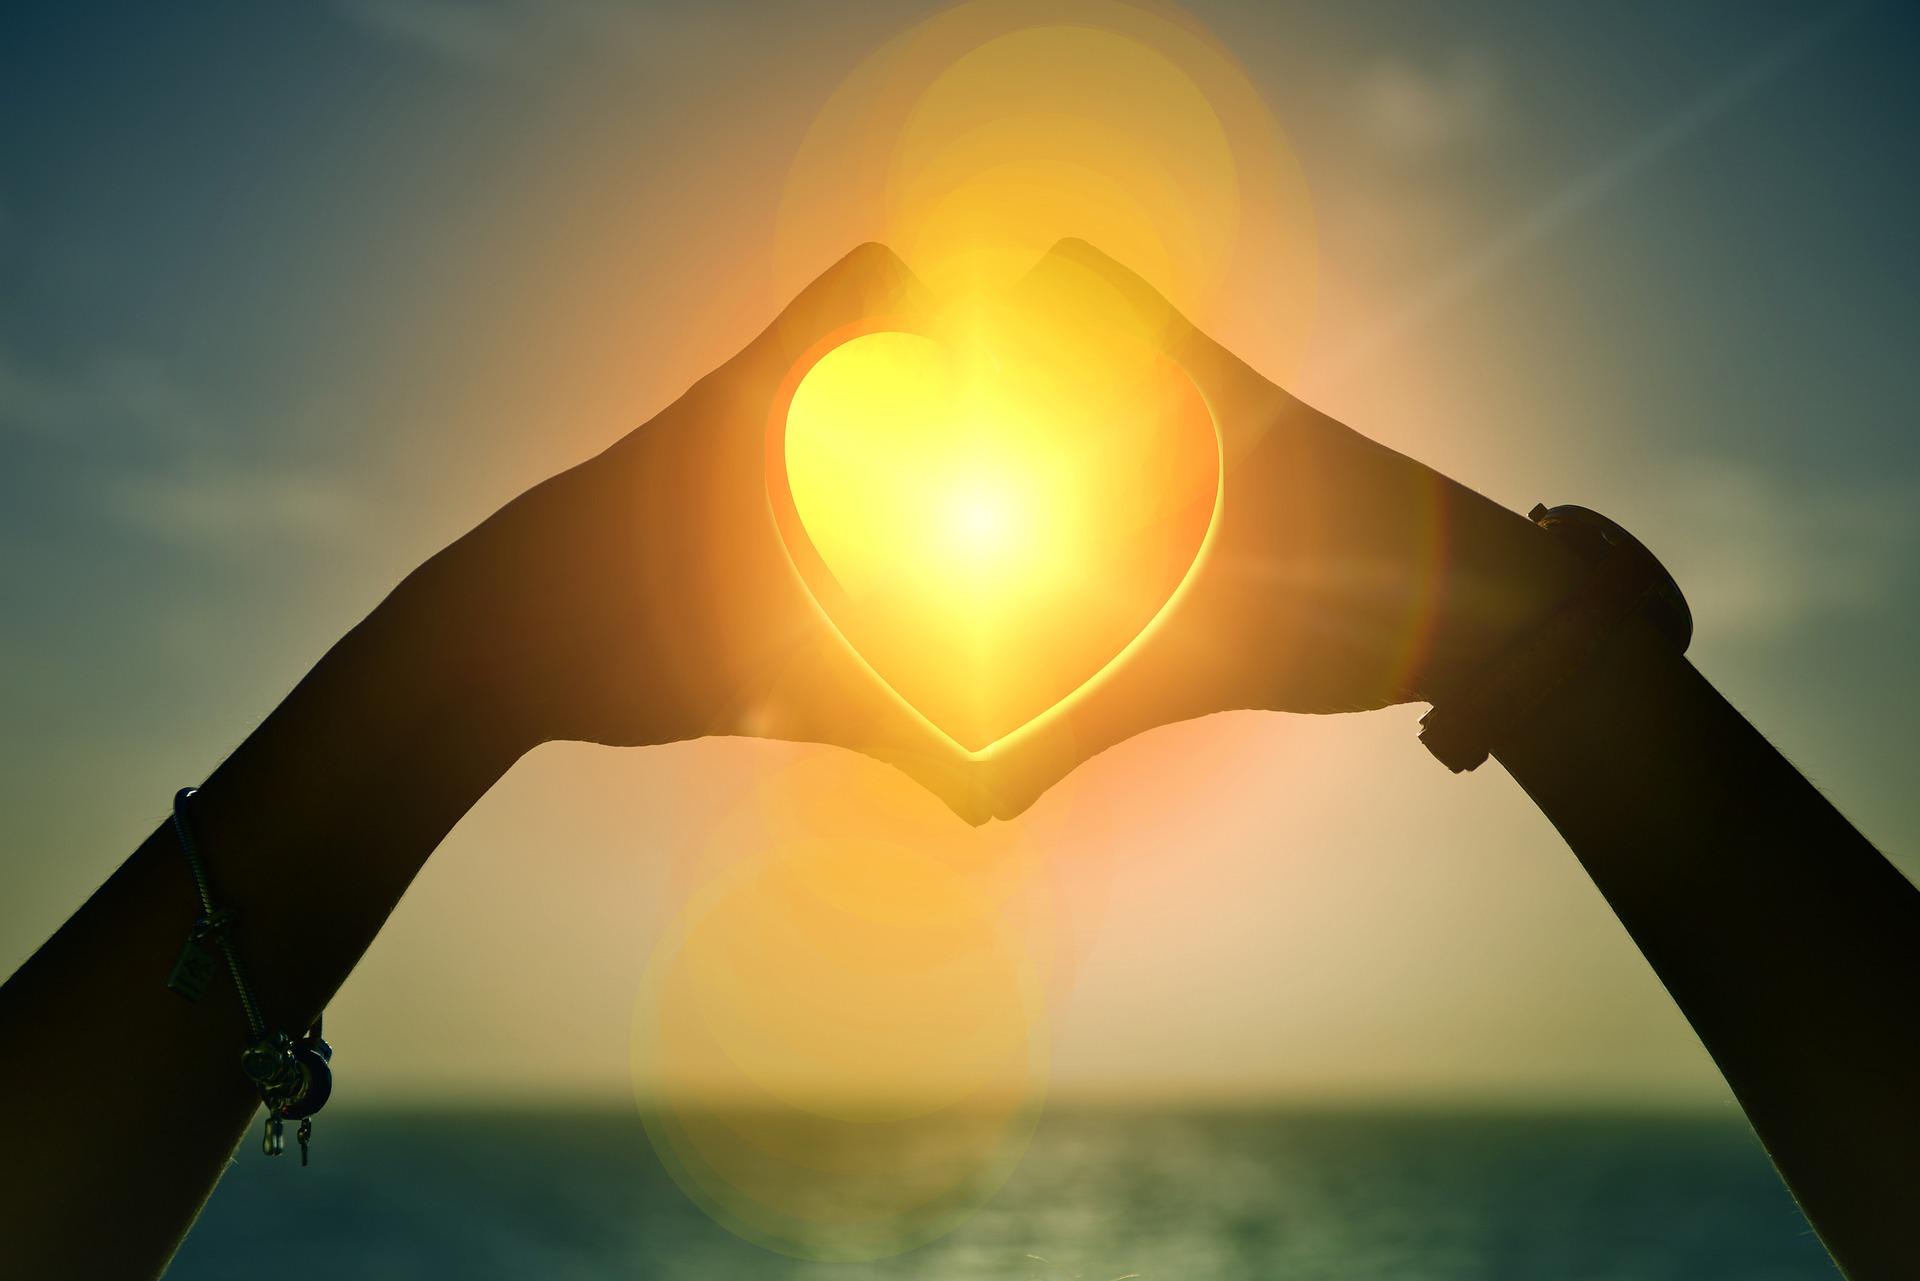 L'amour l'antidote à tout